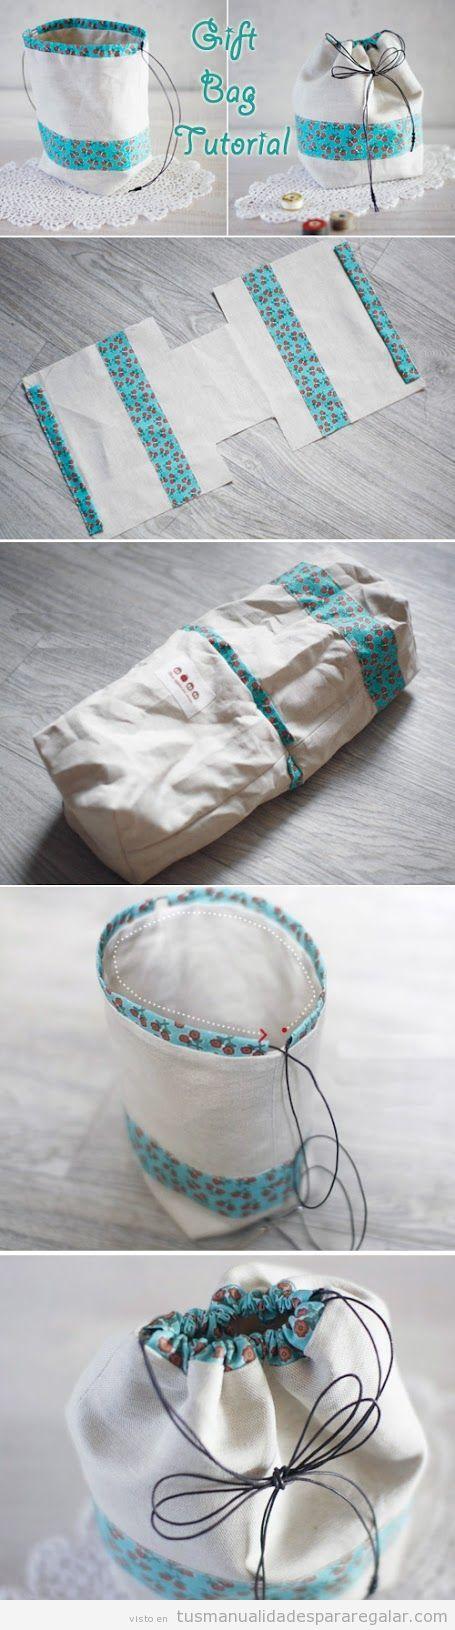 Tutorial bolsa regalo DIY de tela